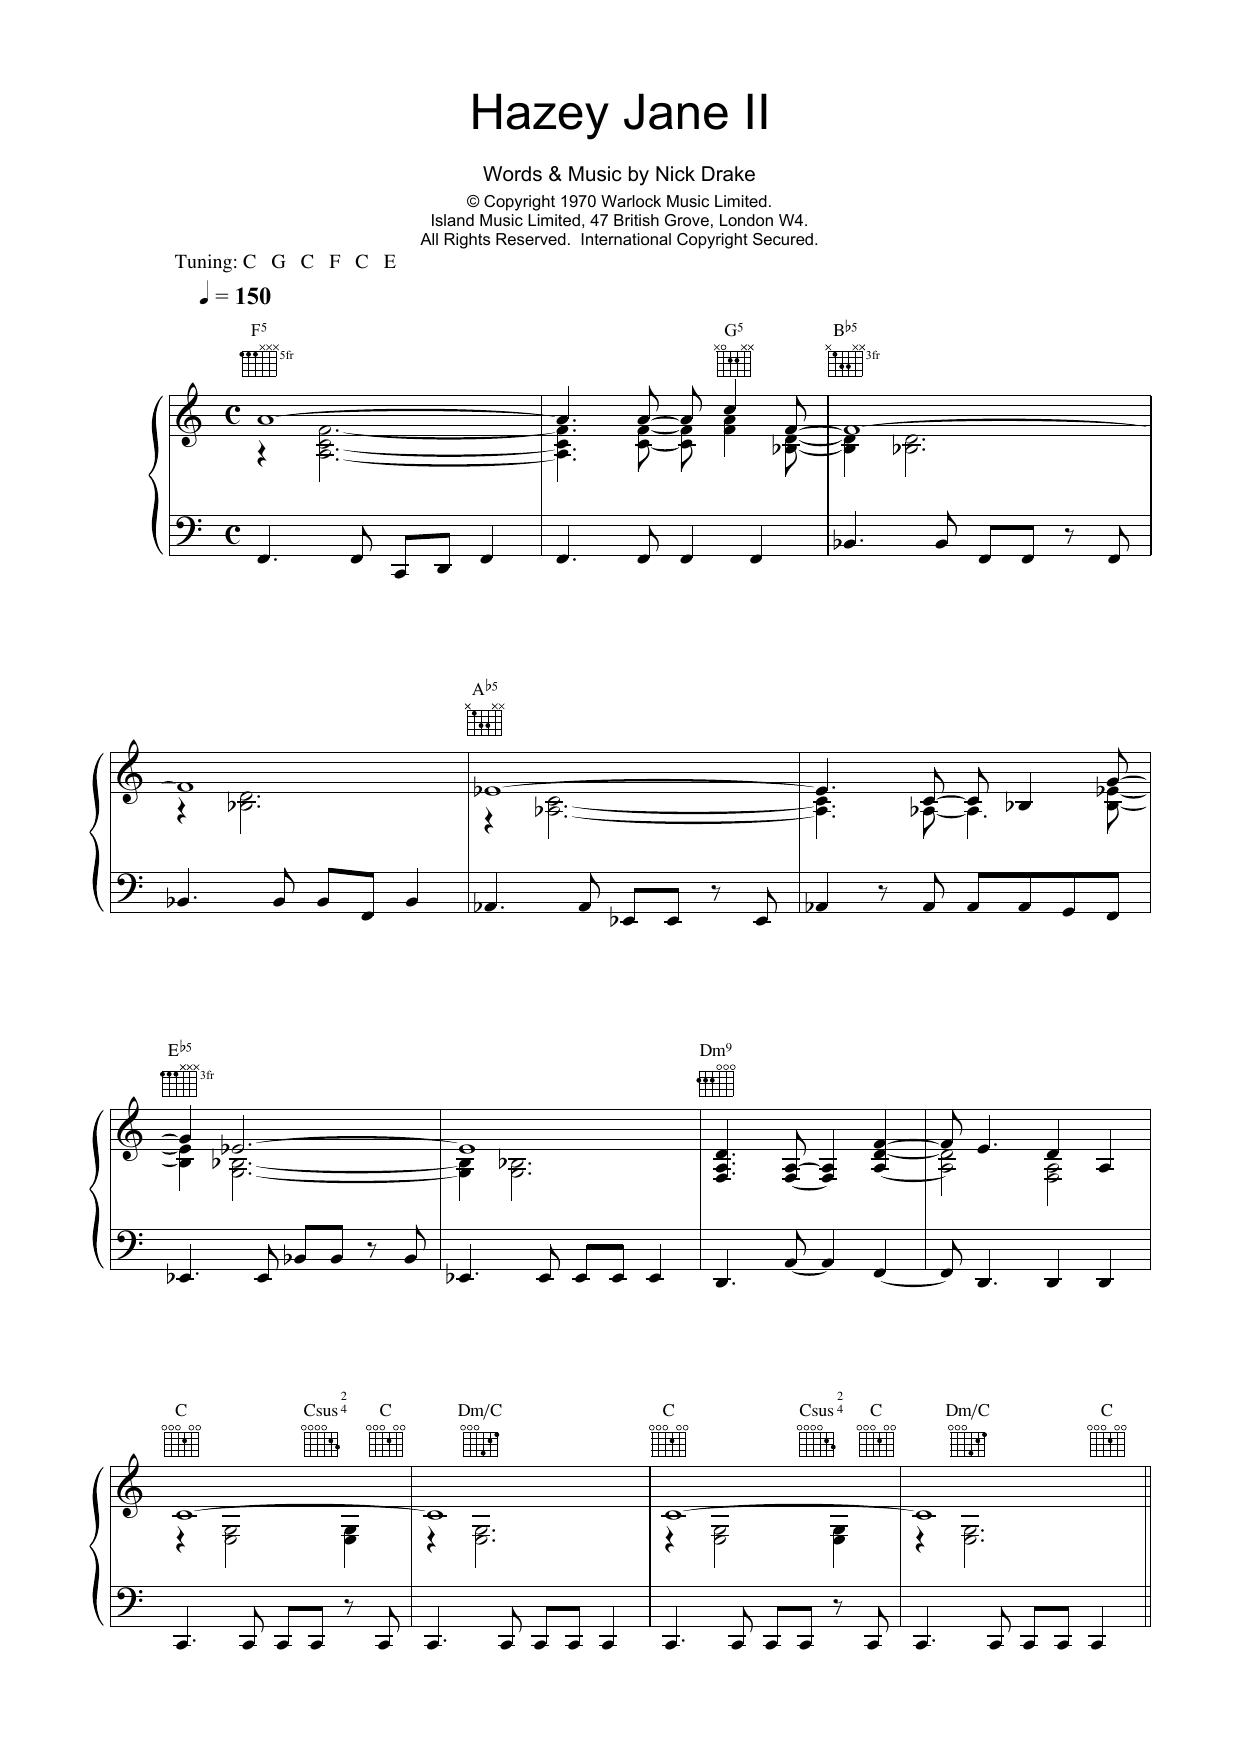 Hazey Jane II Sheet Music